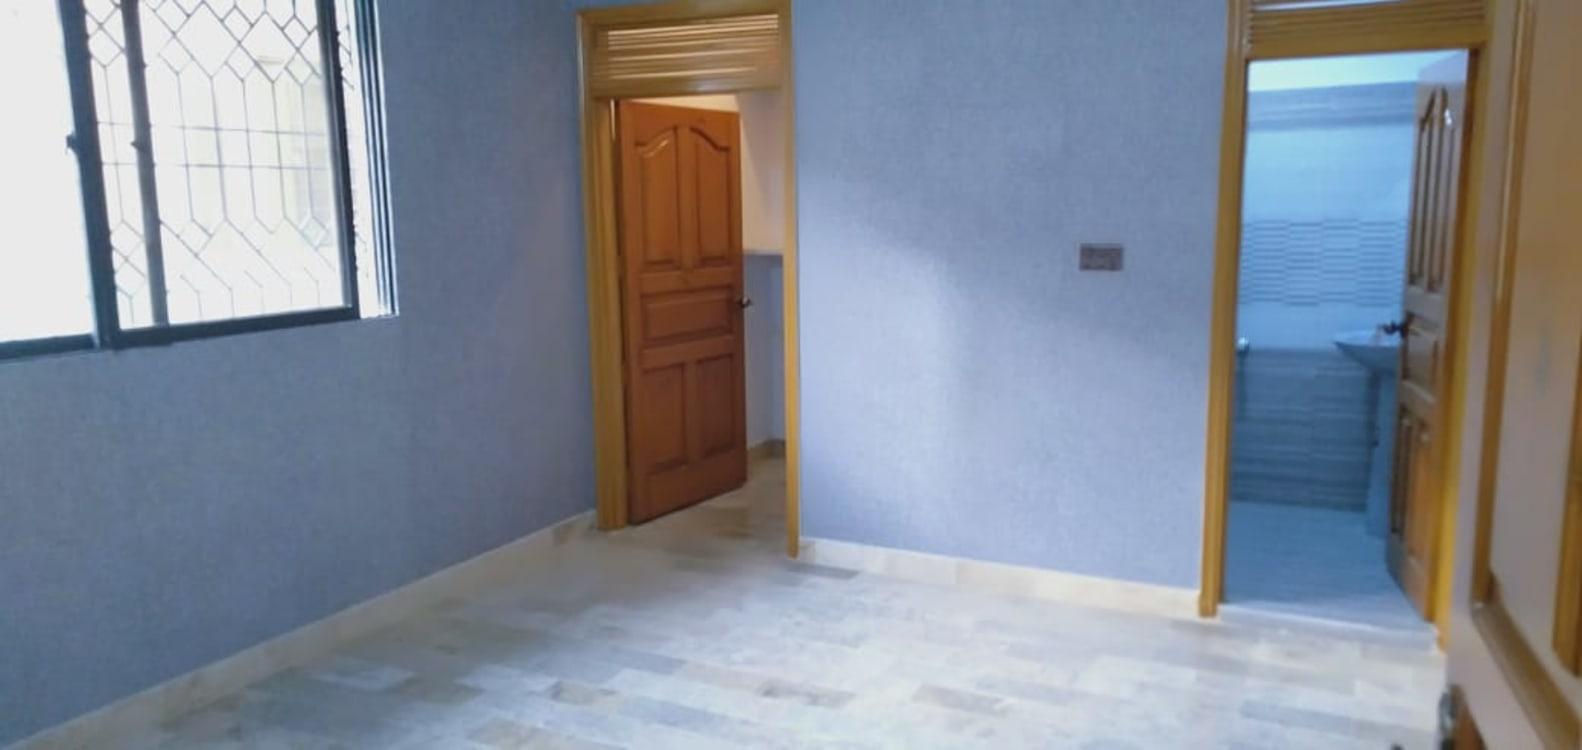 200 Sqyd House for Sale | Graana.com